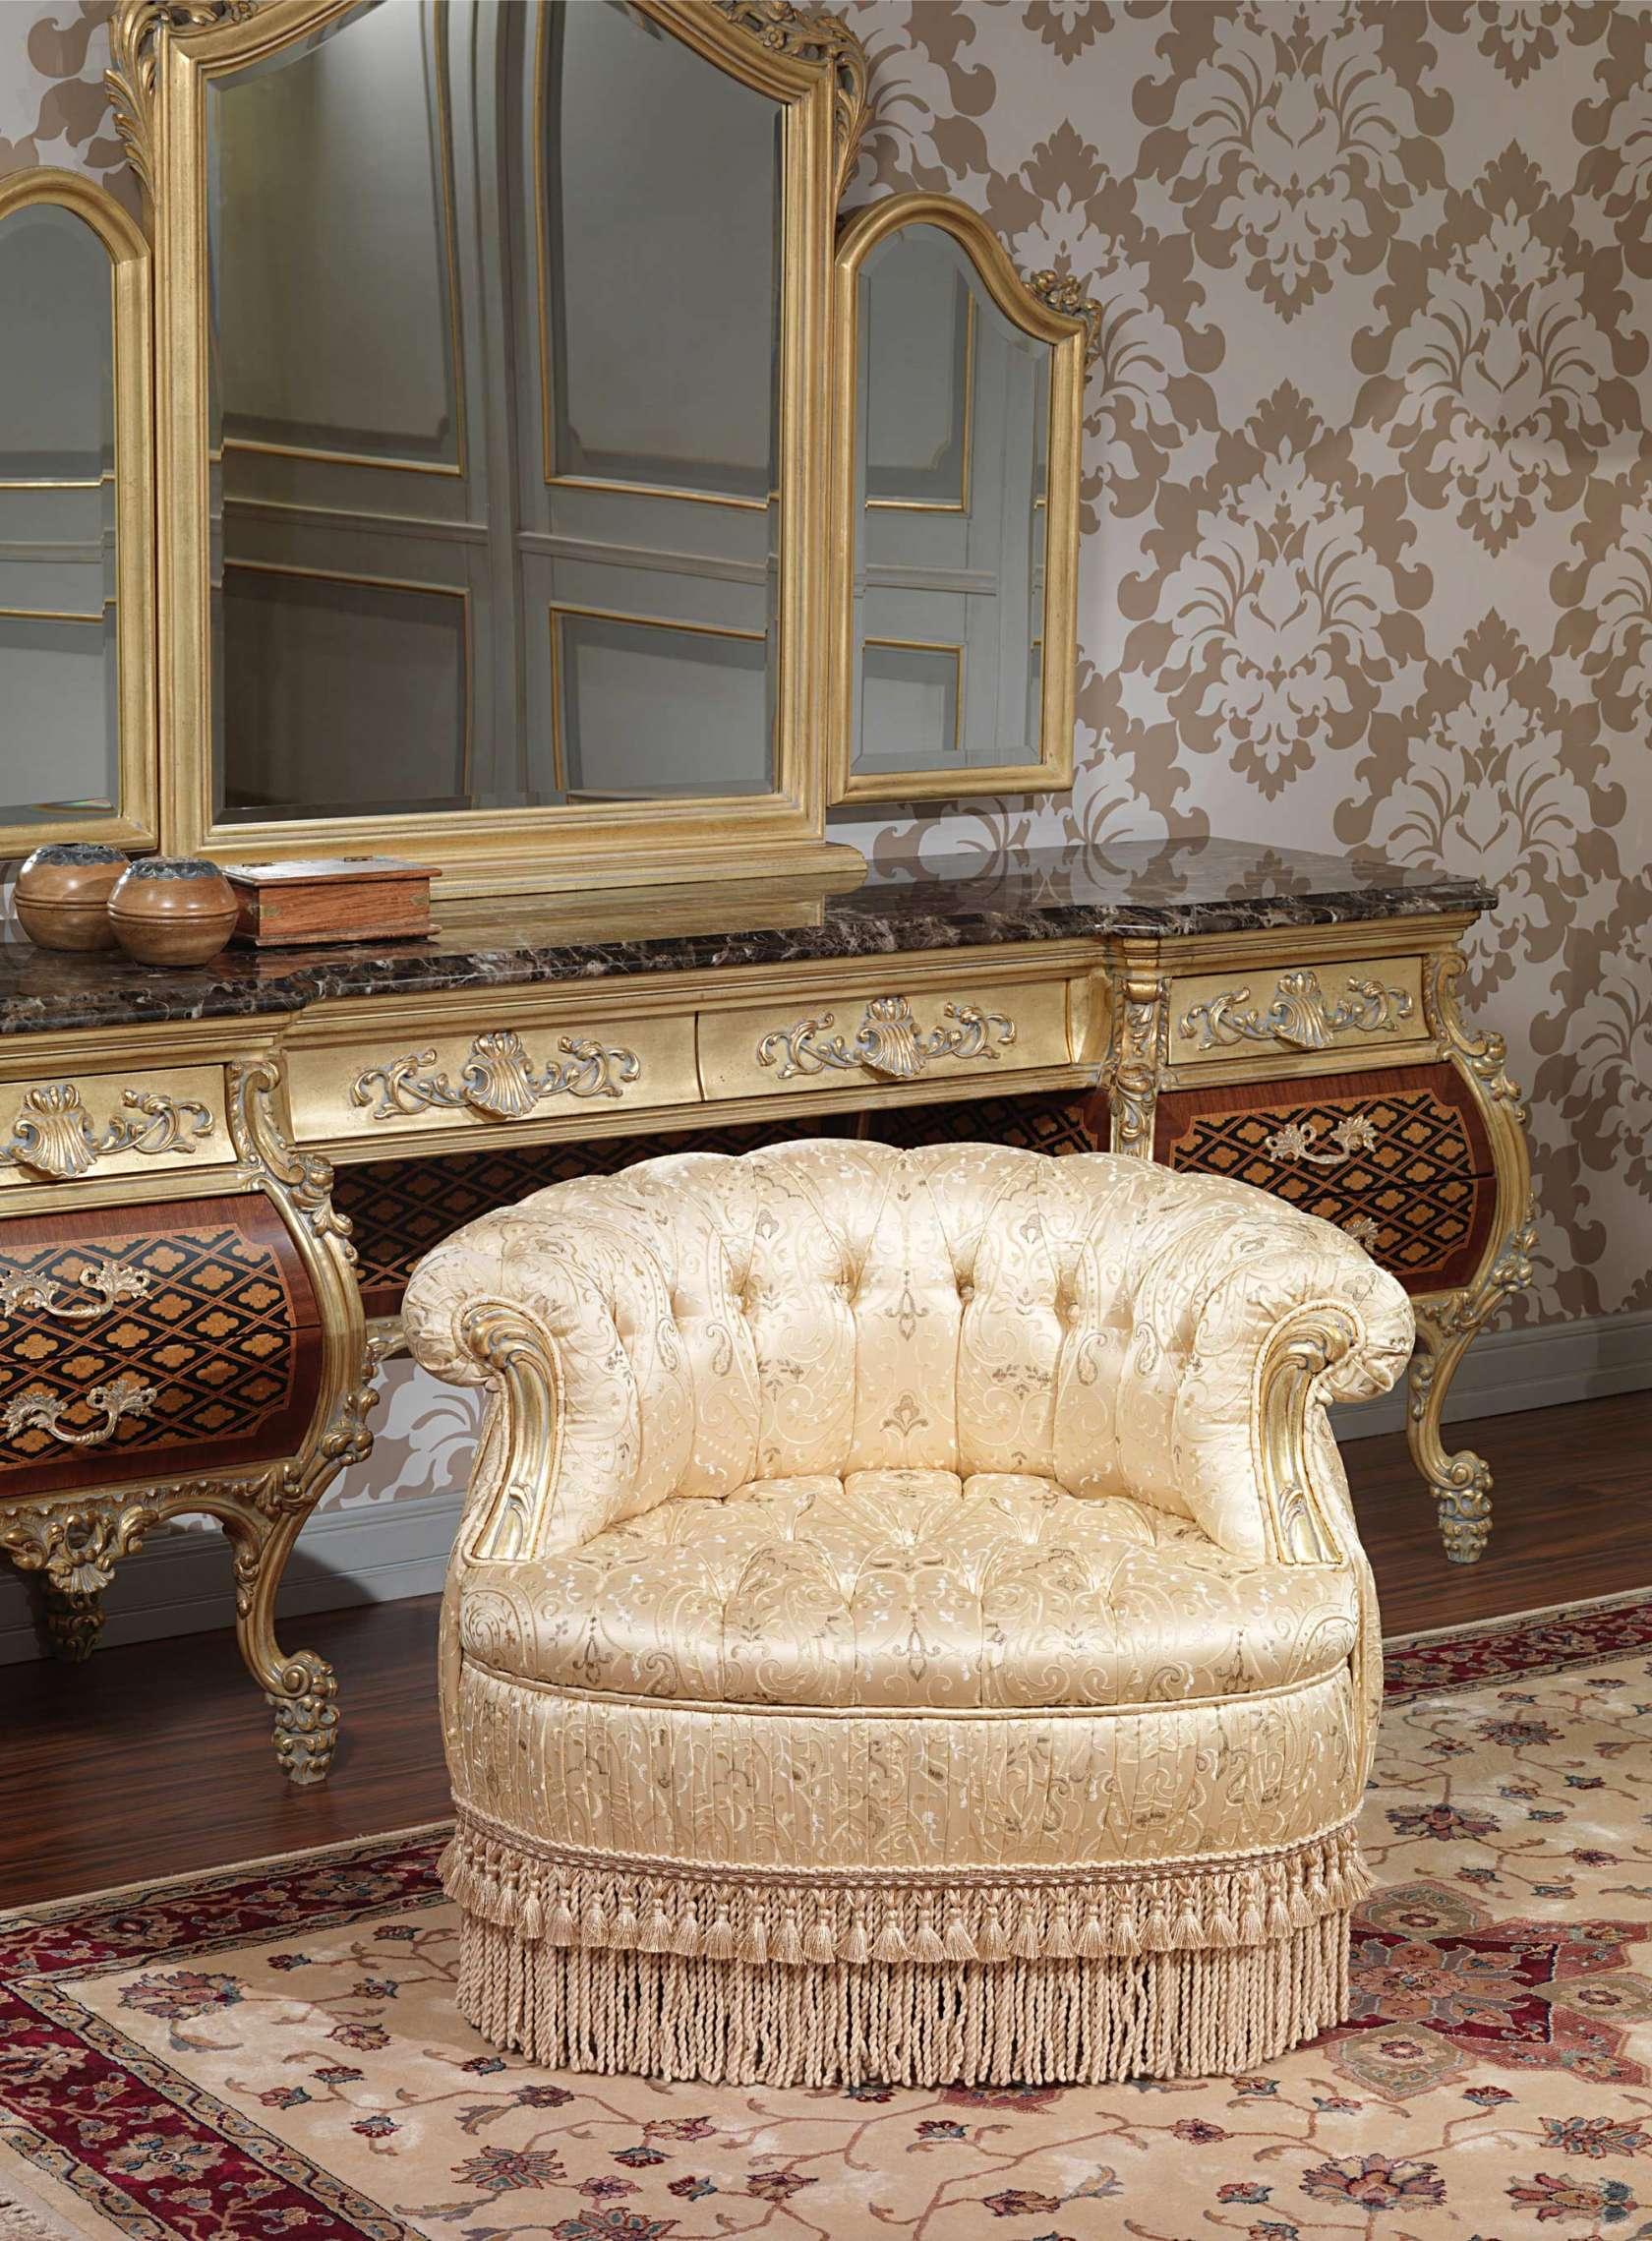 Best poltrona per camera di lusso art with poltrone per - Poltroncina per camera da letto moderna ...